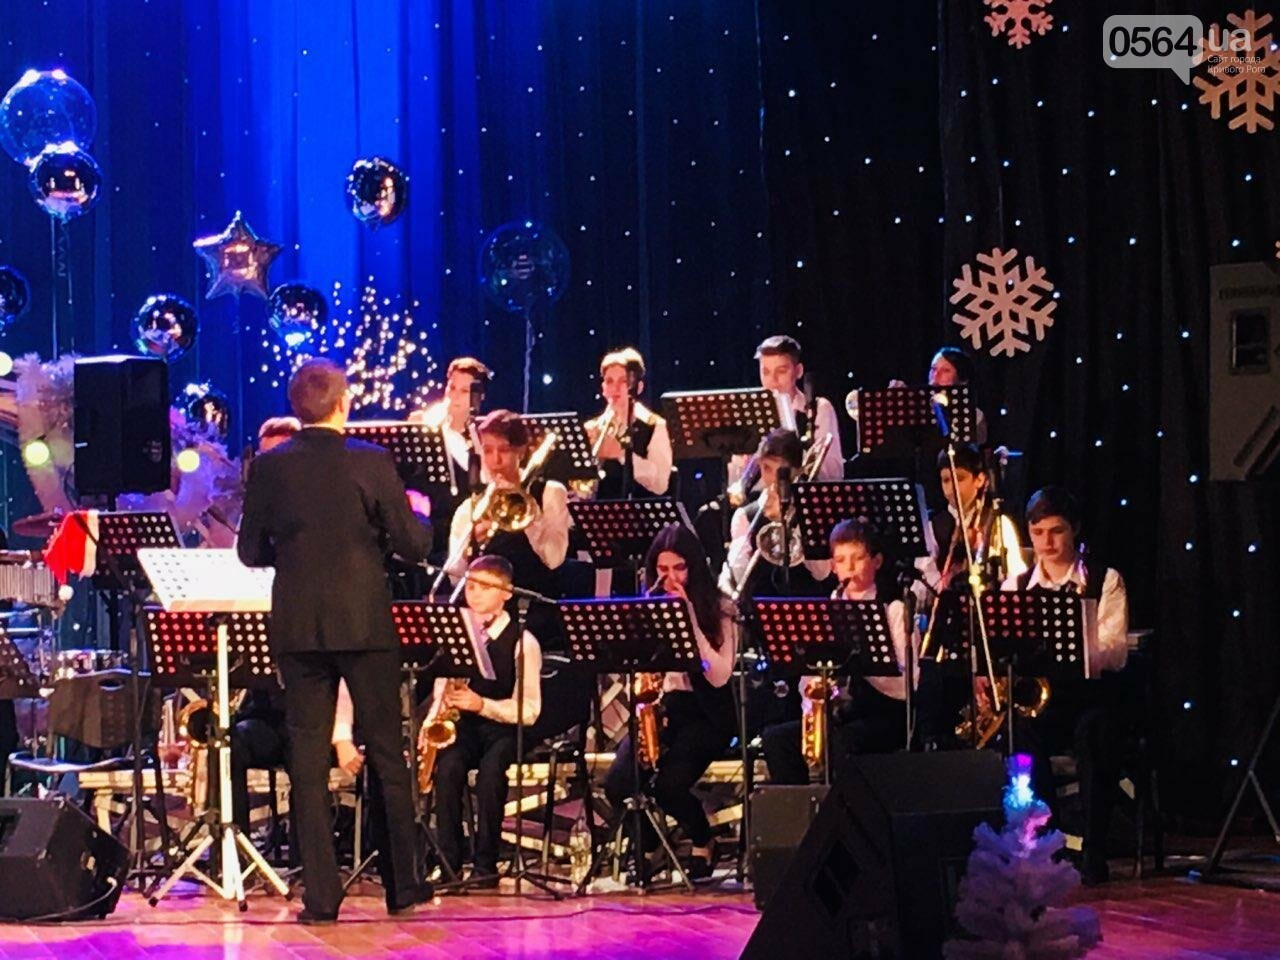 """Let it Snow"": на первое Рождество в Кривом Роге играют джаз, - ФОТО, ВИДЕО, фото-3"